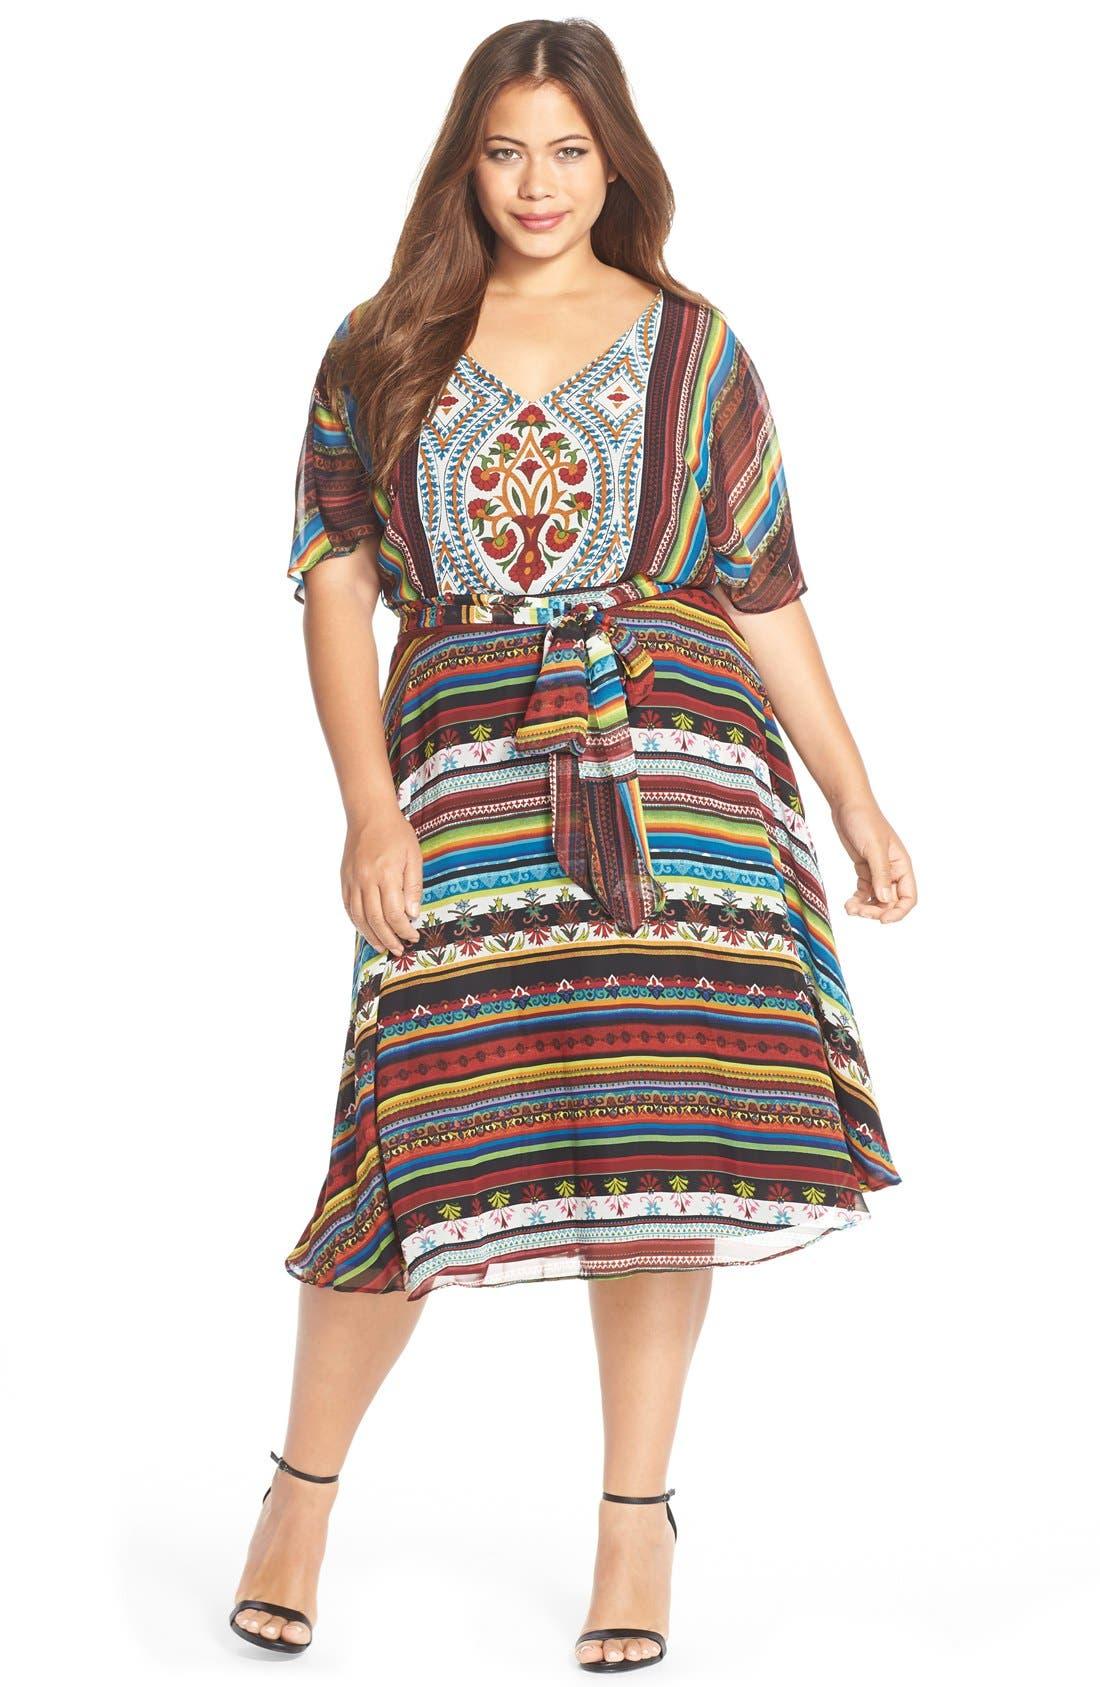 Alternate Image 1 Selected - Gabby Skye 'Boho Chic' Belted Print Chiffon Dress (Plus Size)